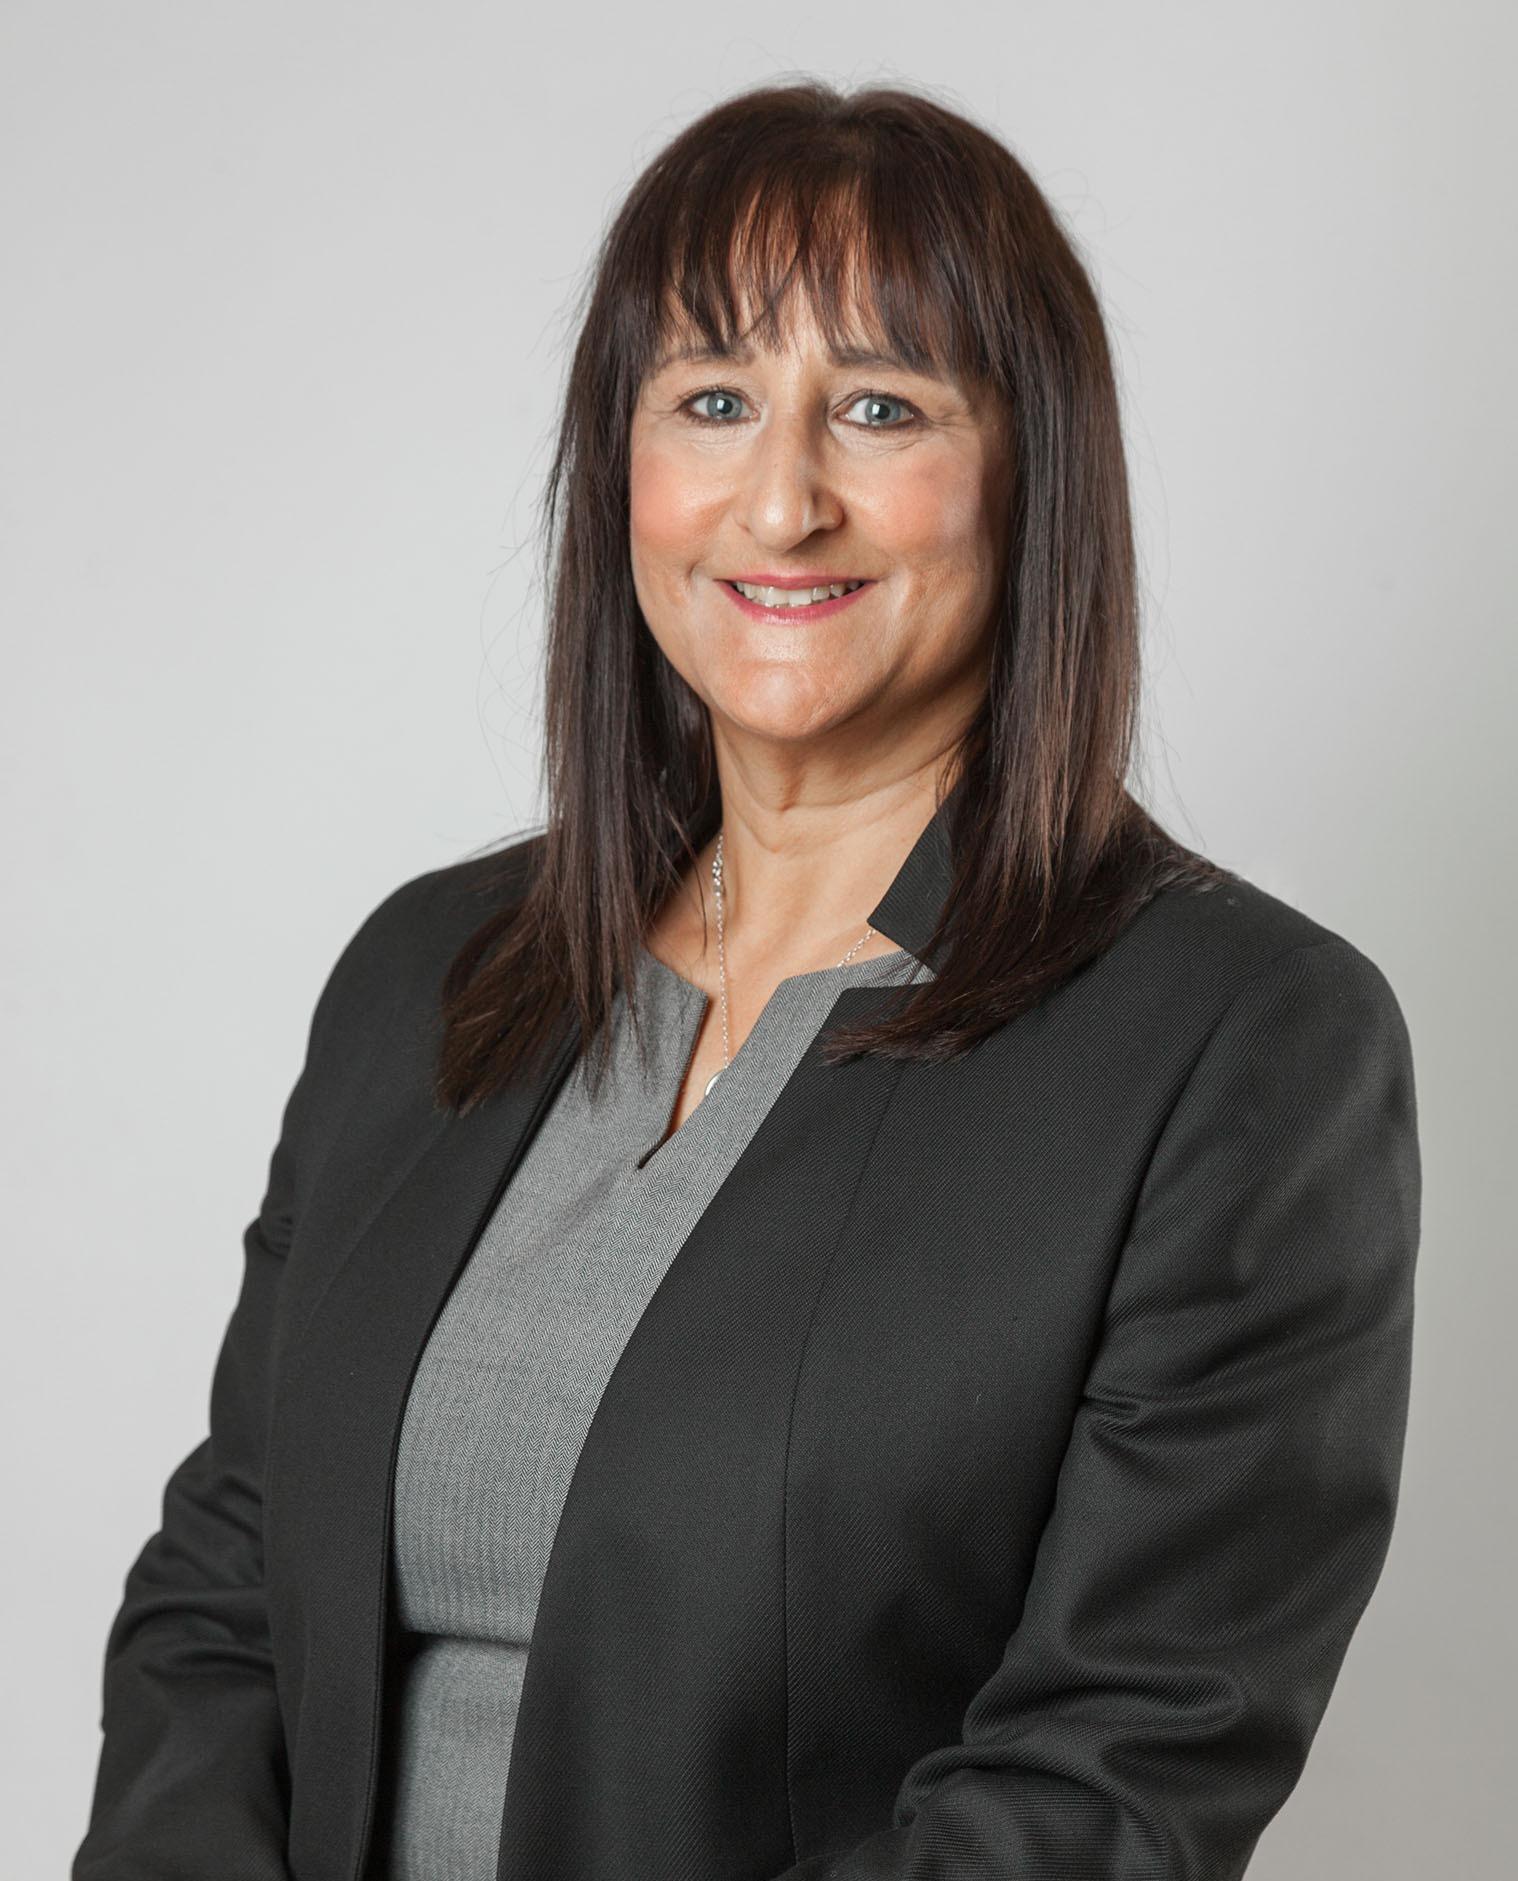 Marlene Banting